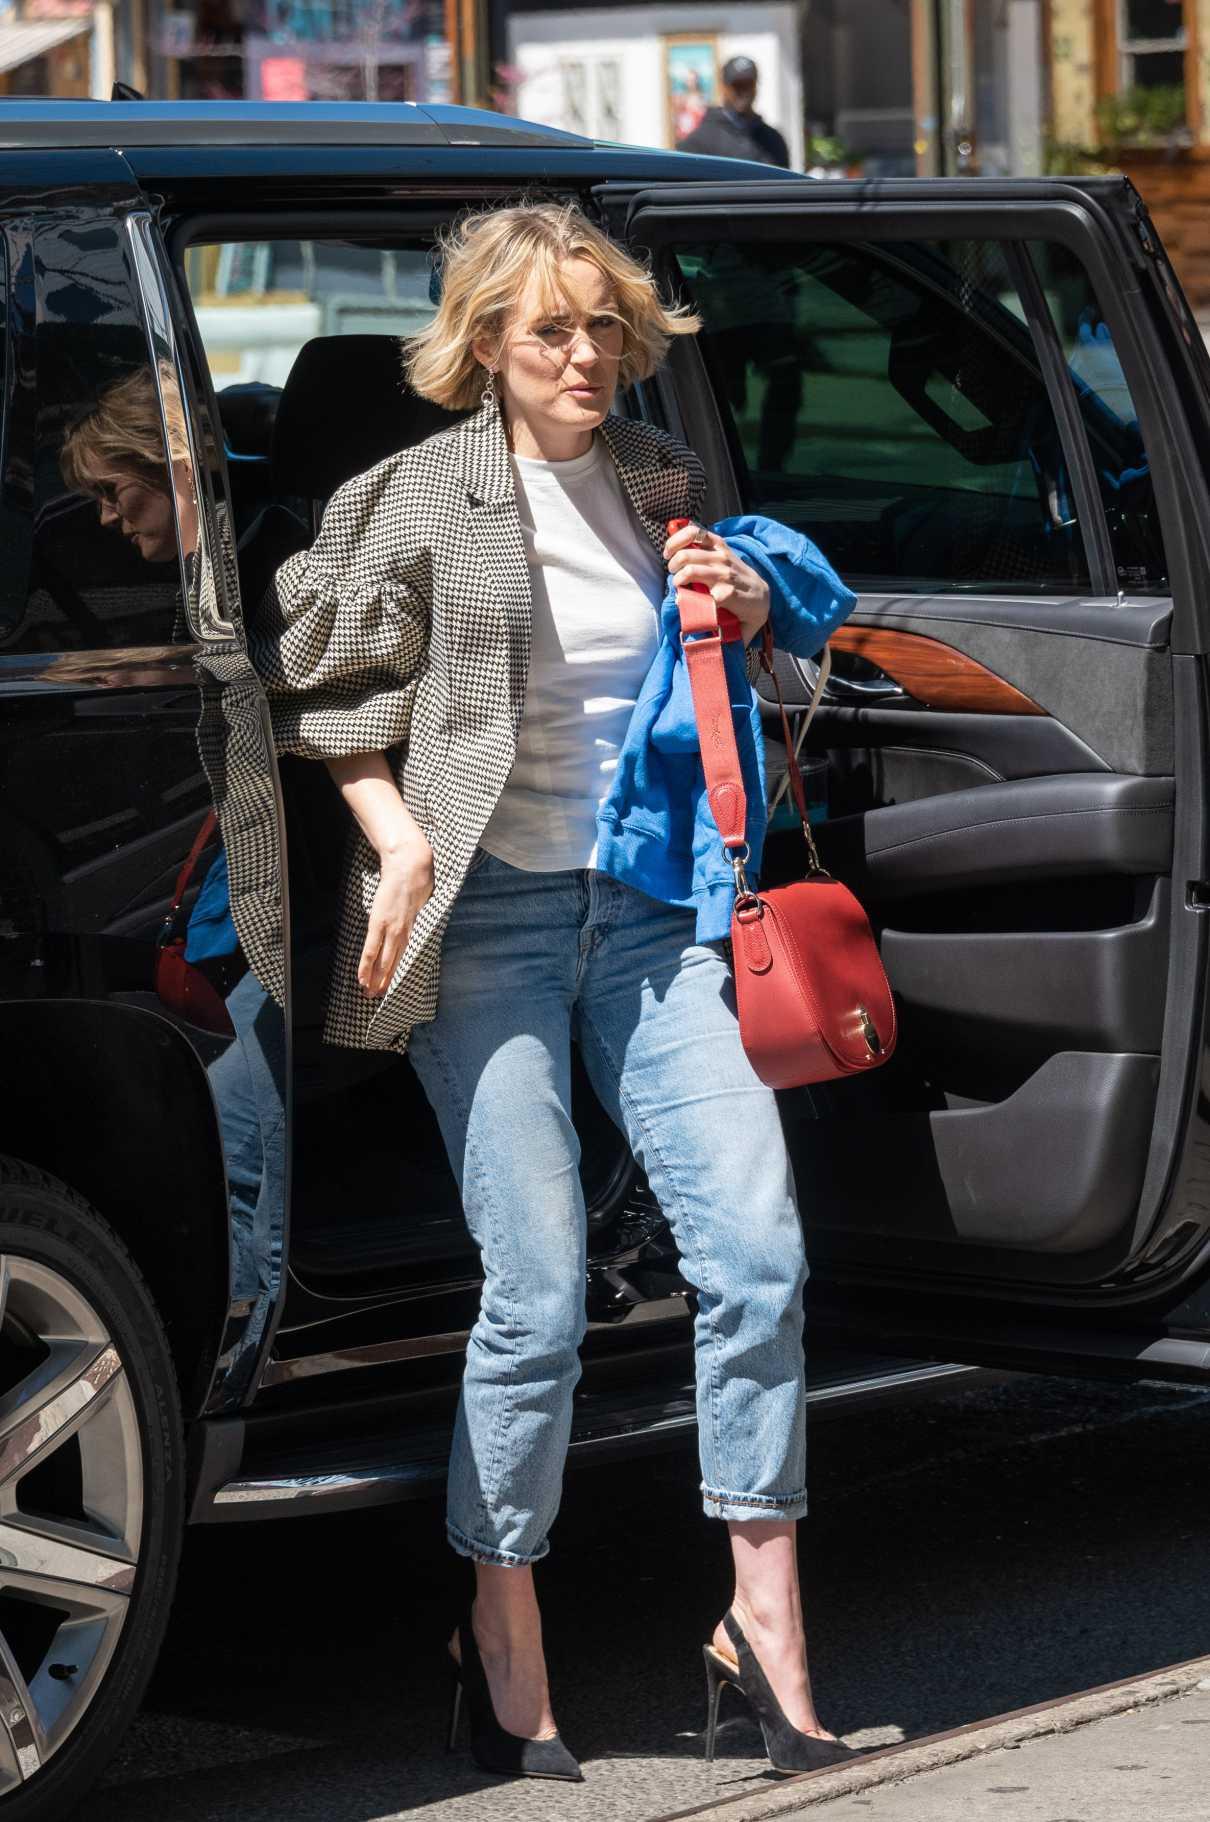 Taylor Schilling in a Gray Blazer